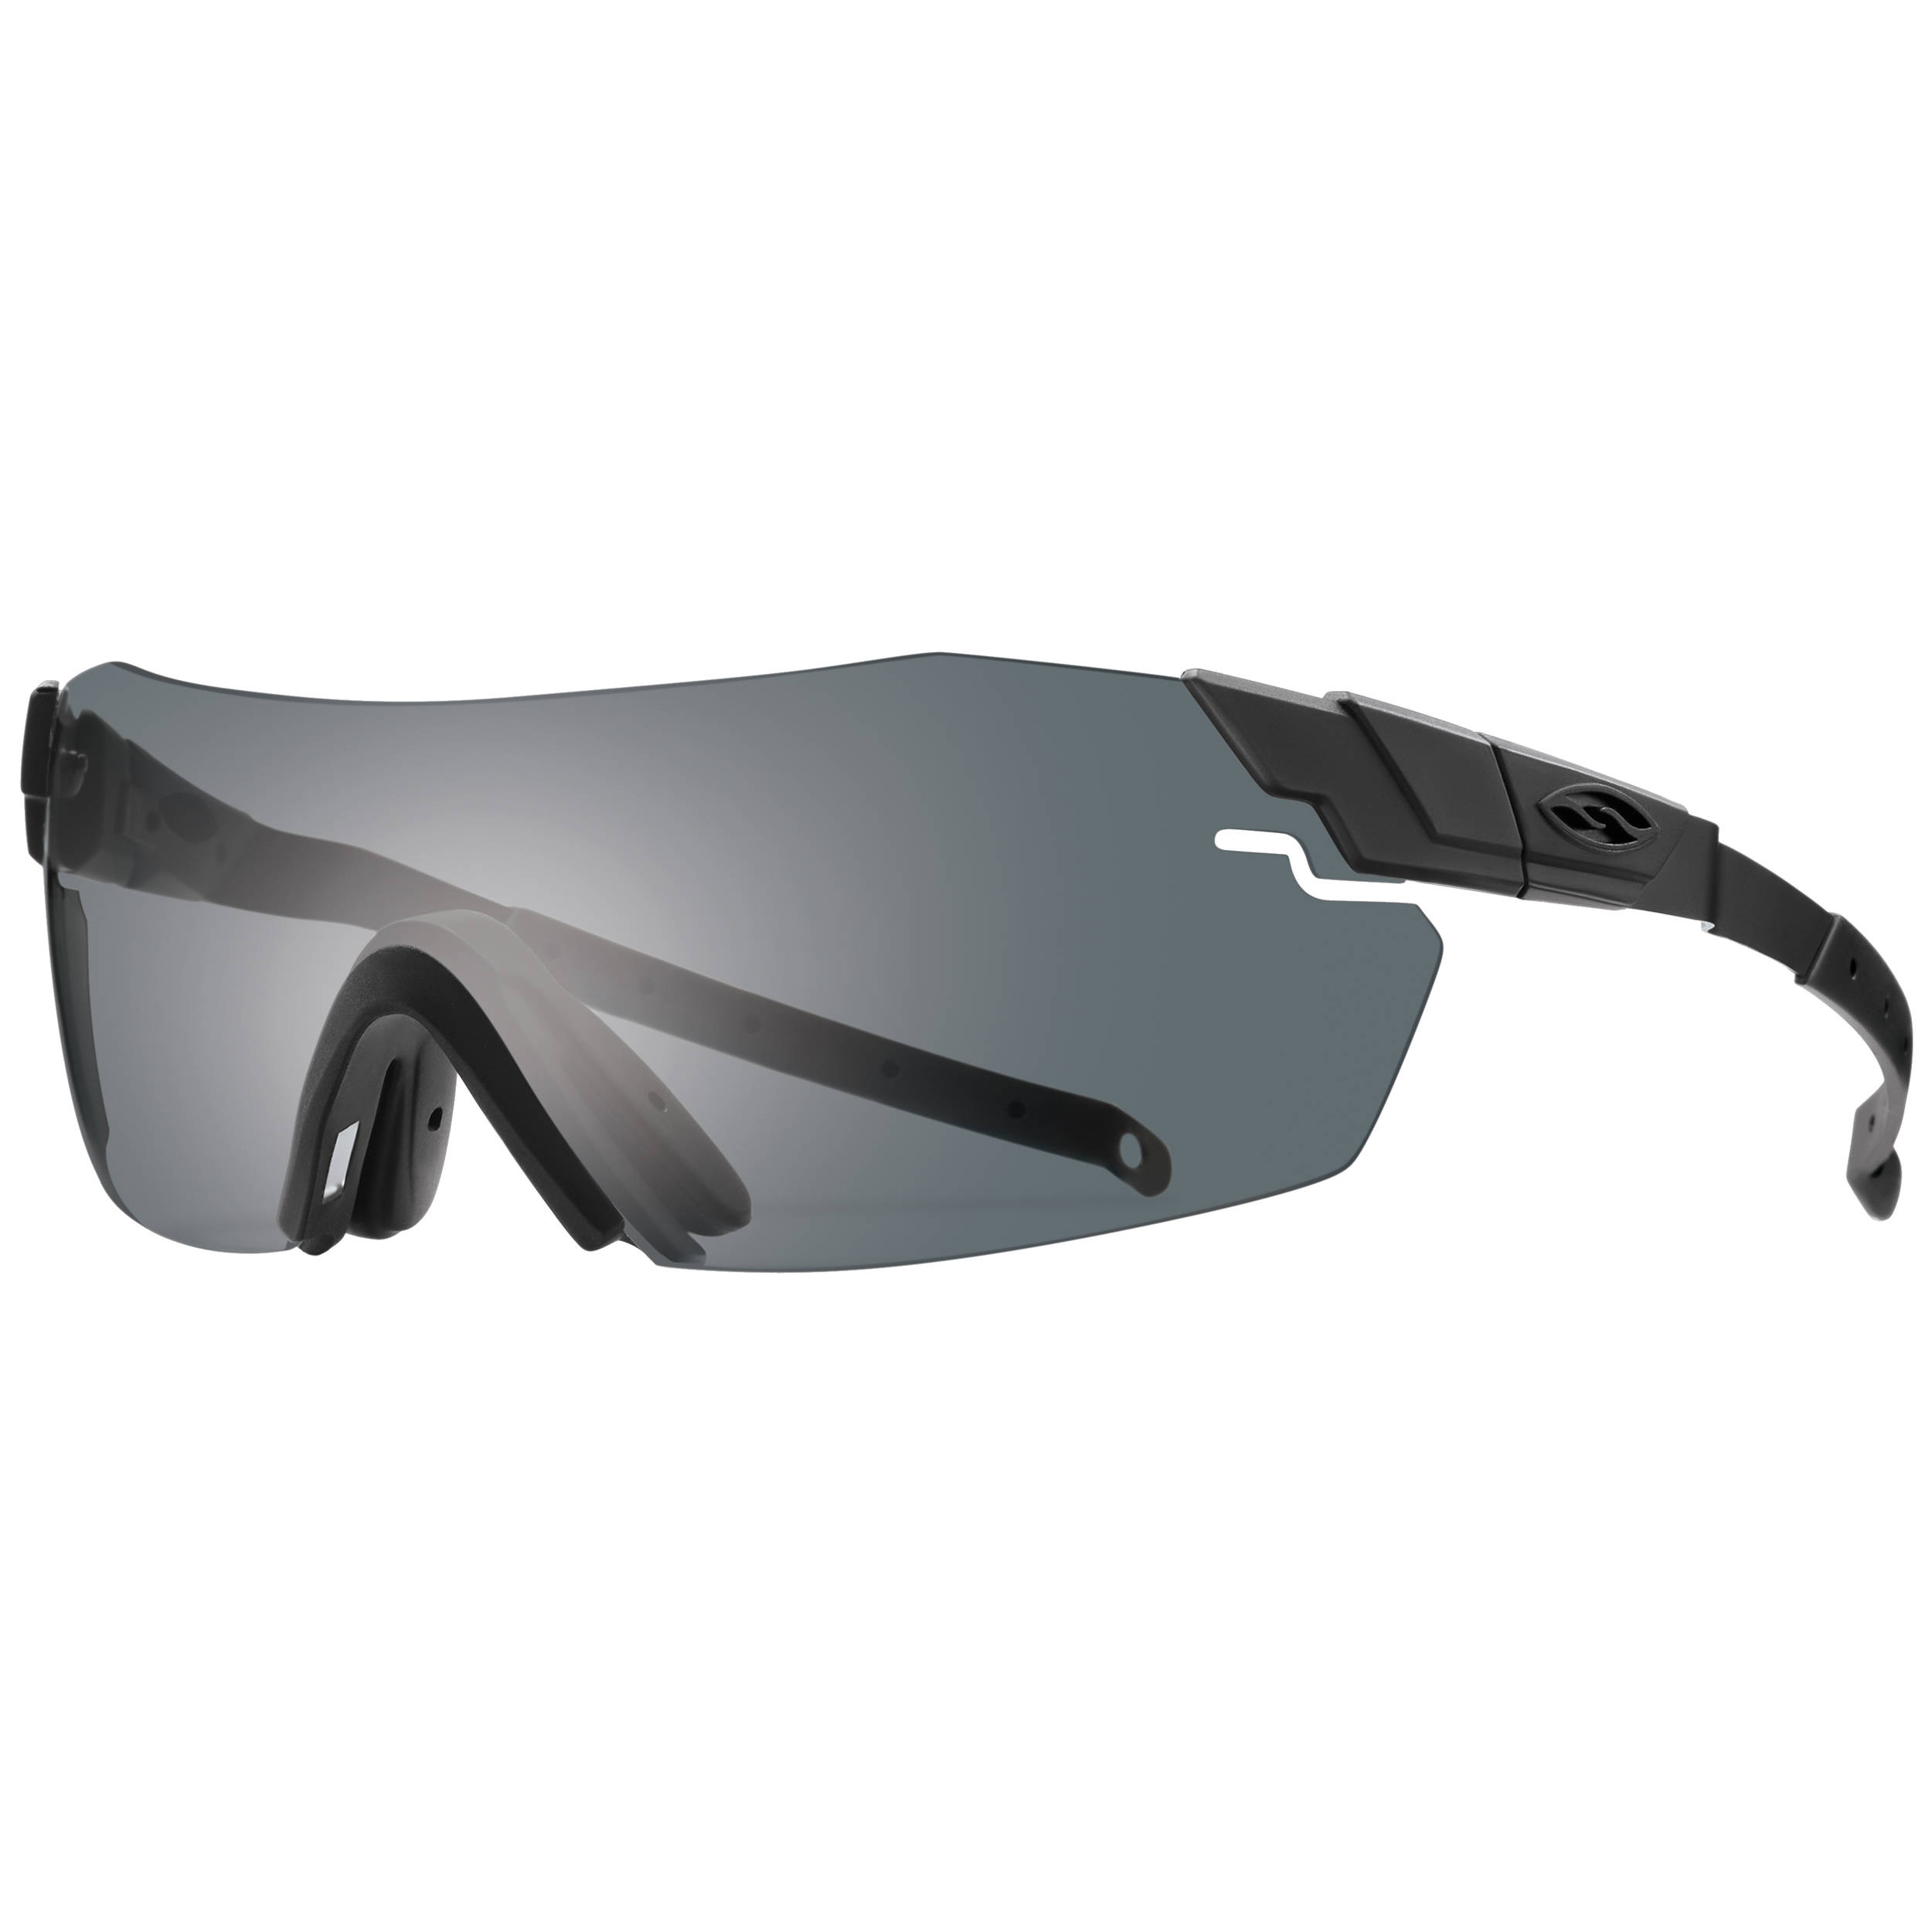 Smith Optics PivLock Echo Max Elite Eyeshield (Black)